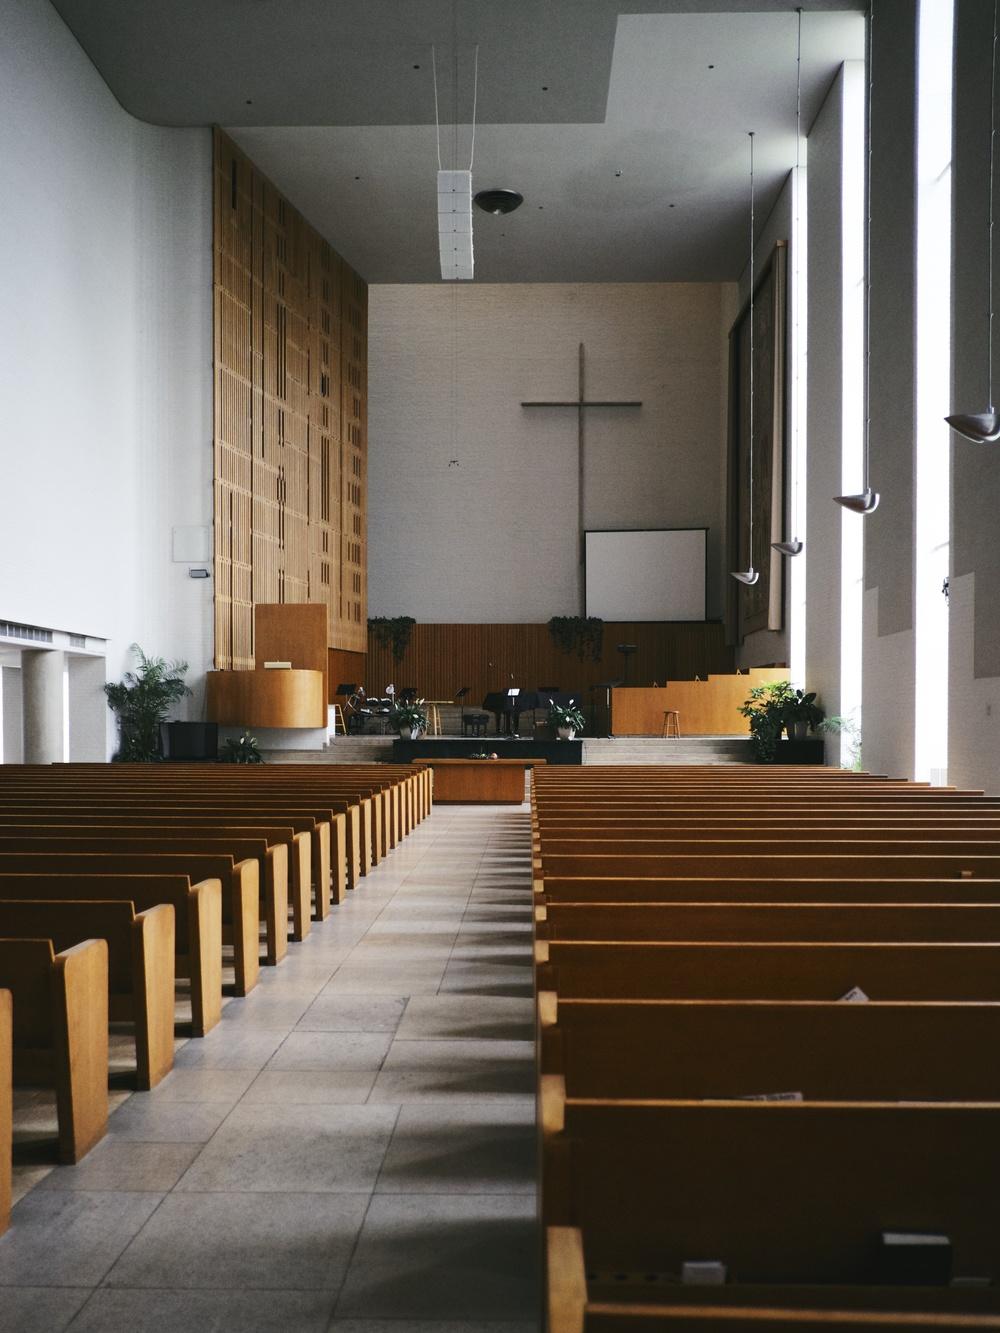 First Christian Church, designed byEliel Saarinen.